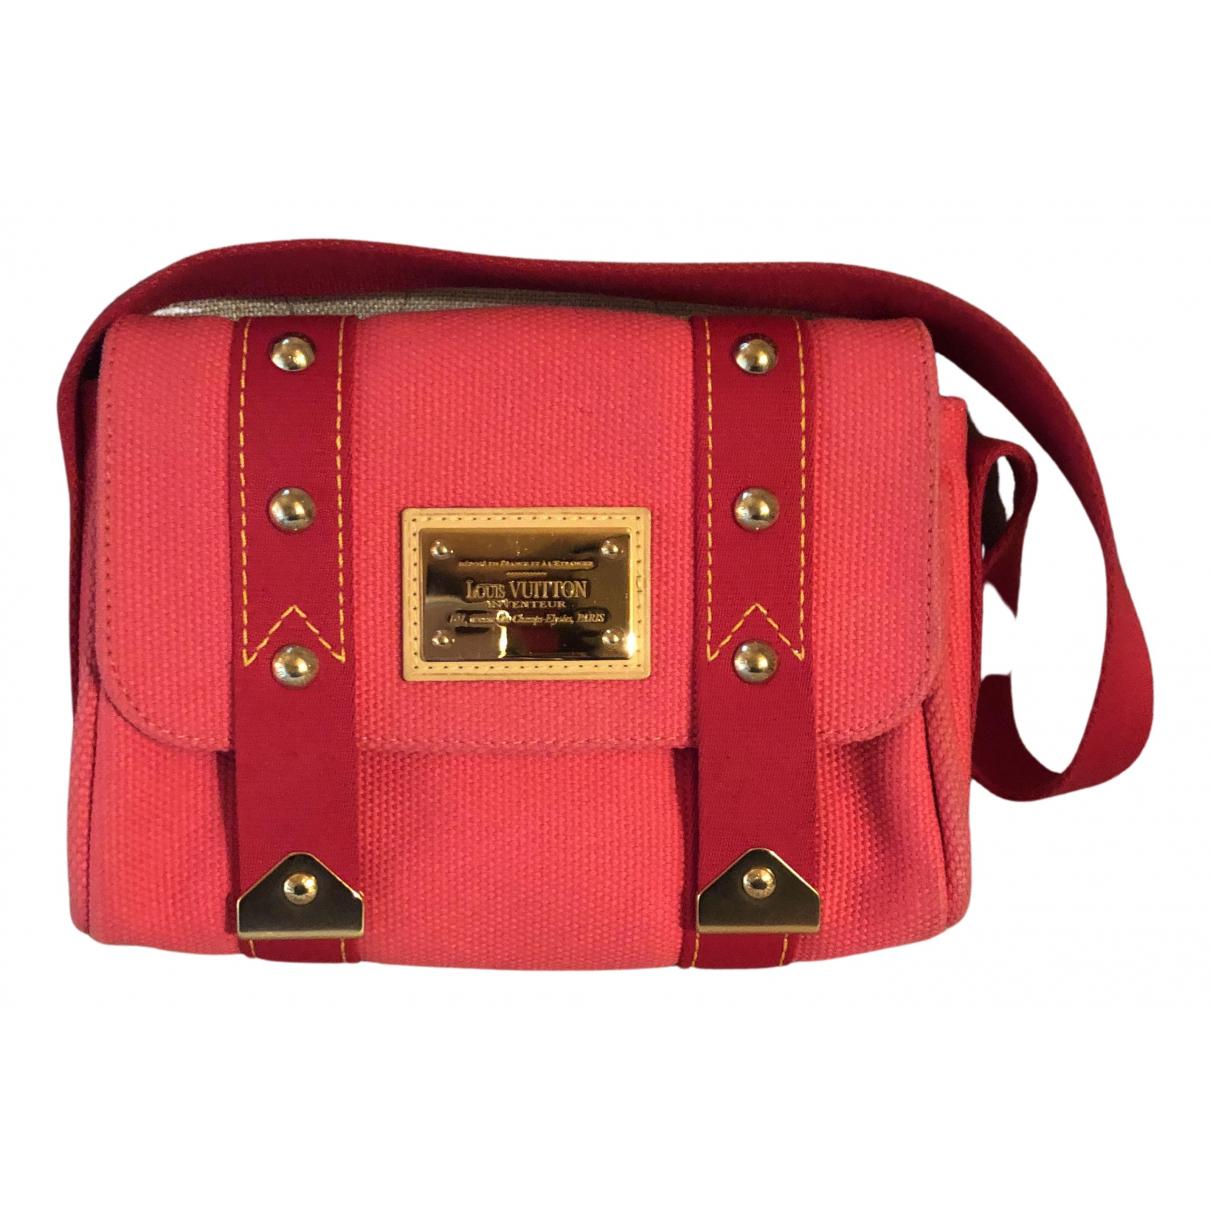 Bandolera Antigua de Lona Louis Vuitton